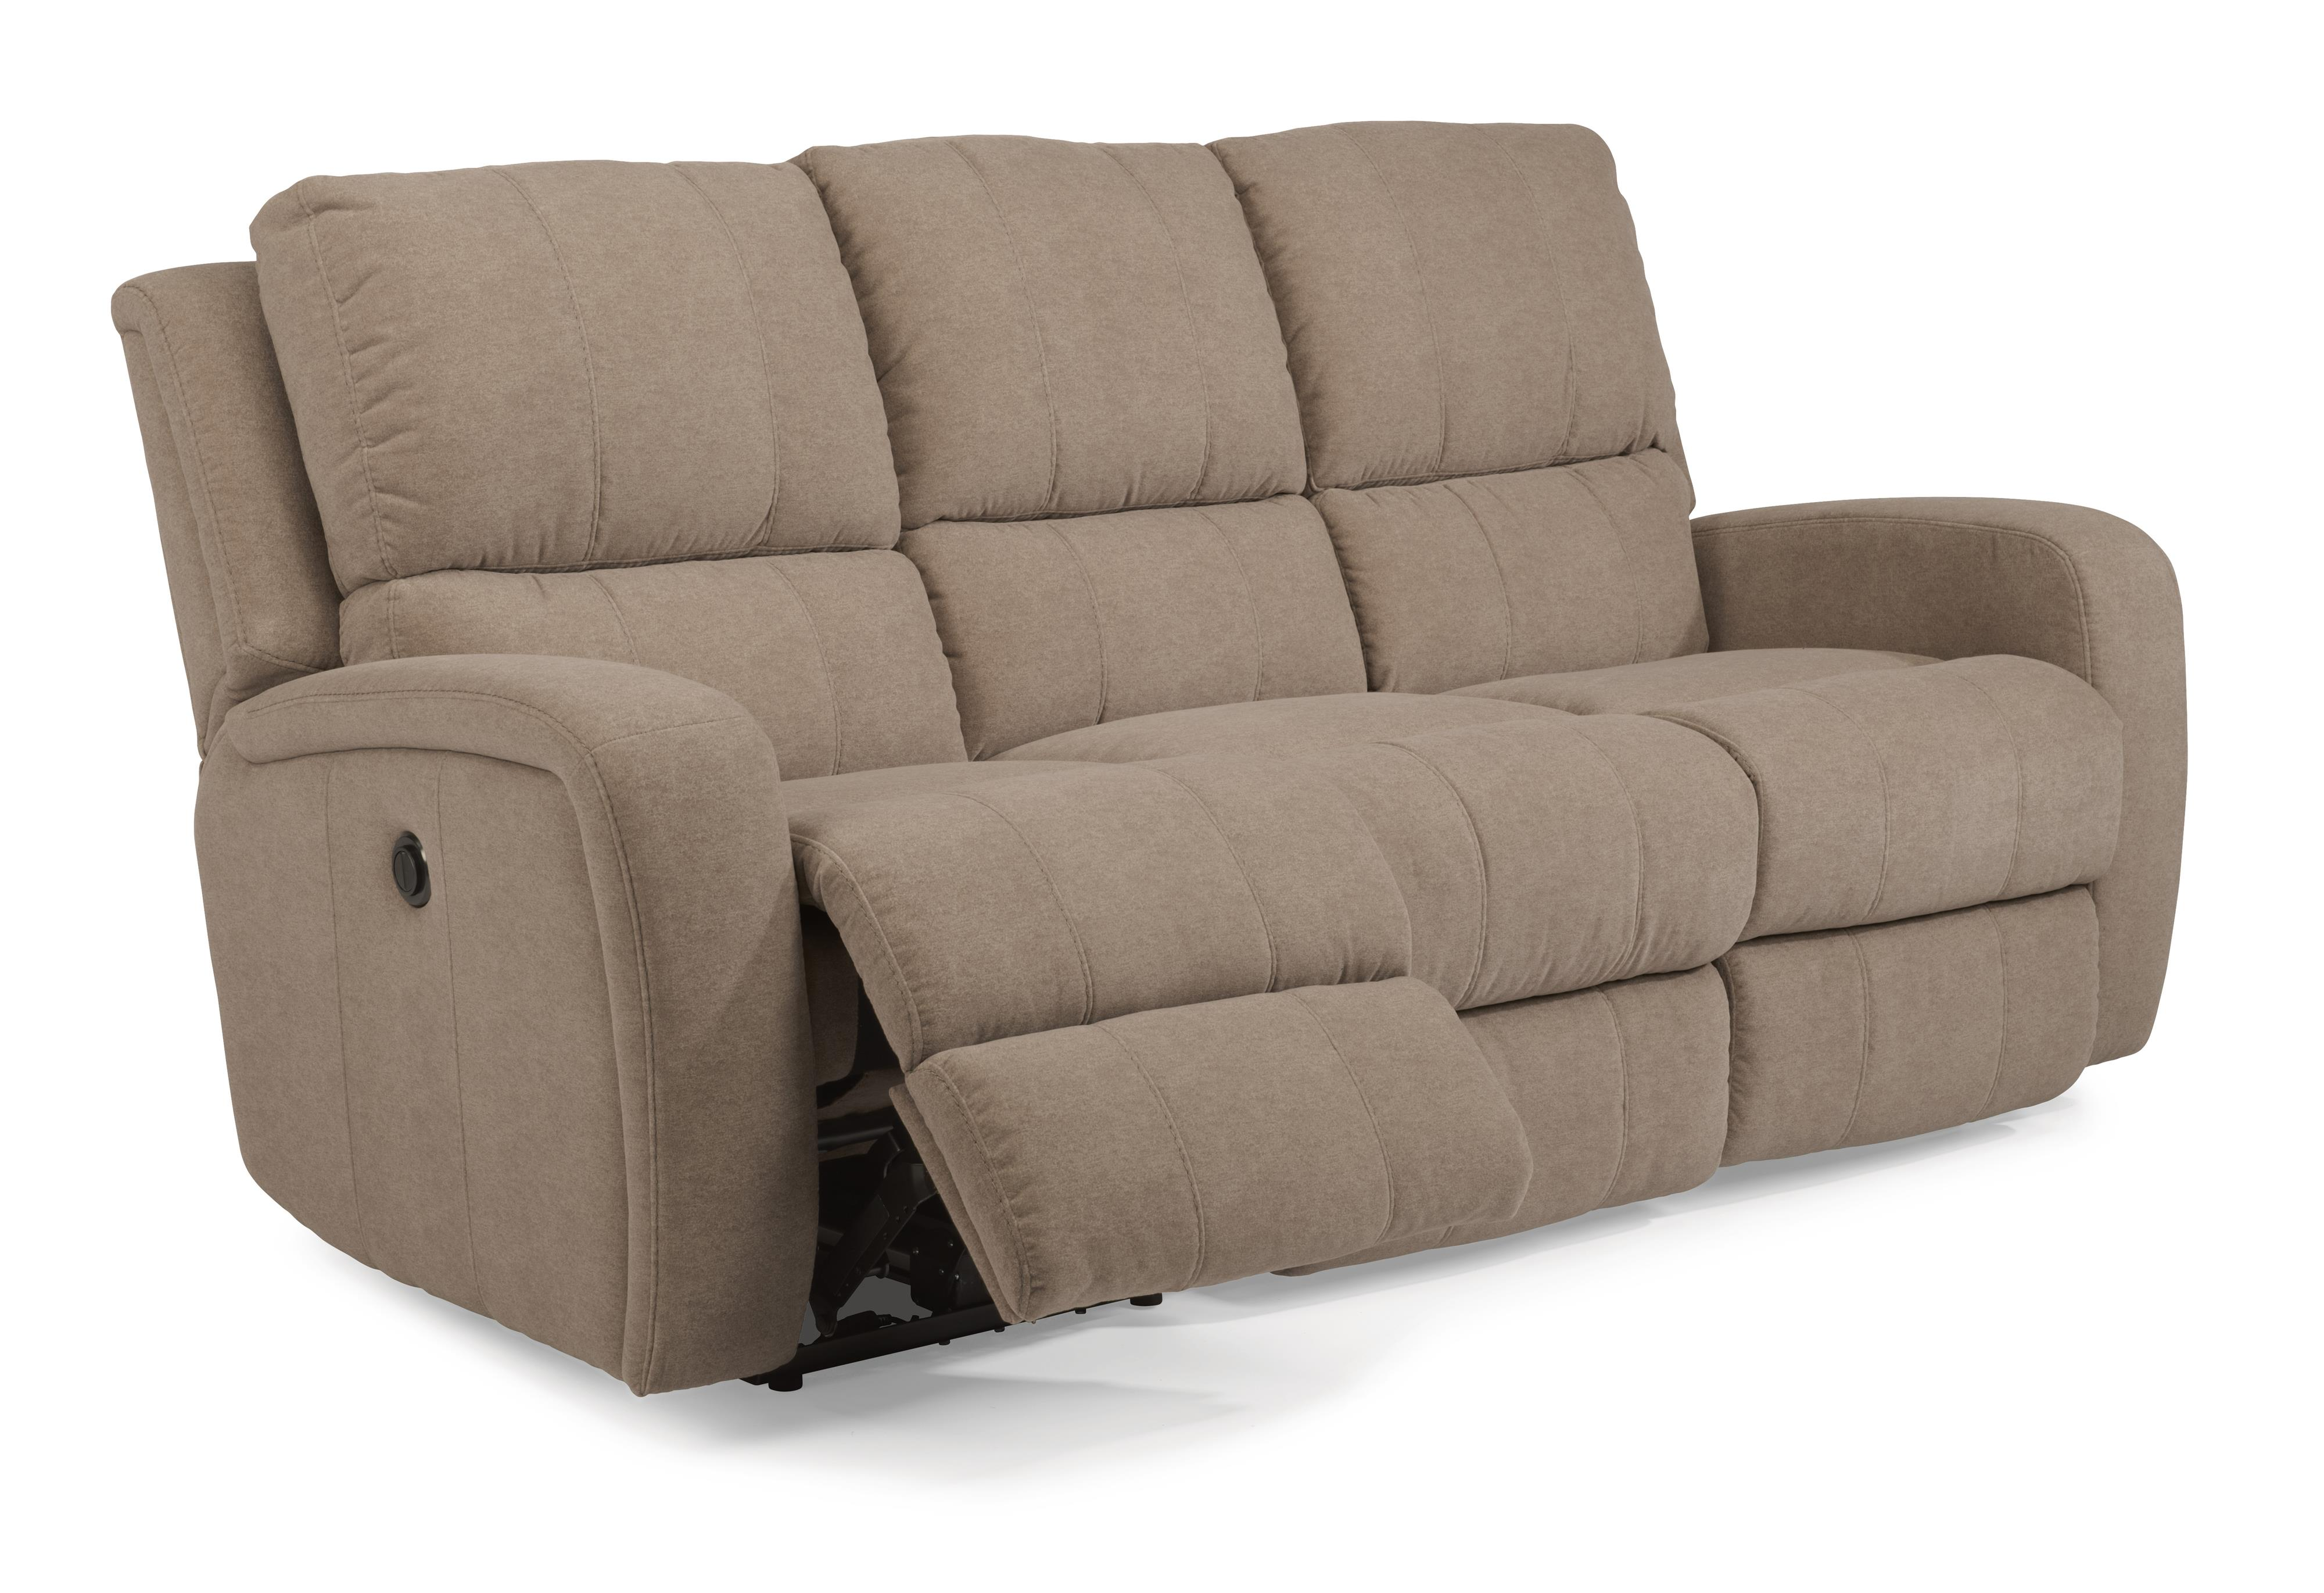 Double Reclining Sofa w/ Power